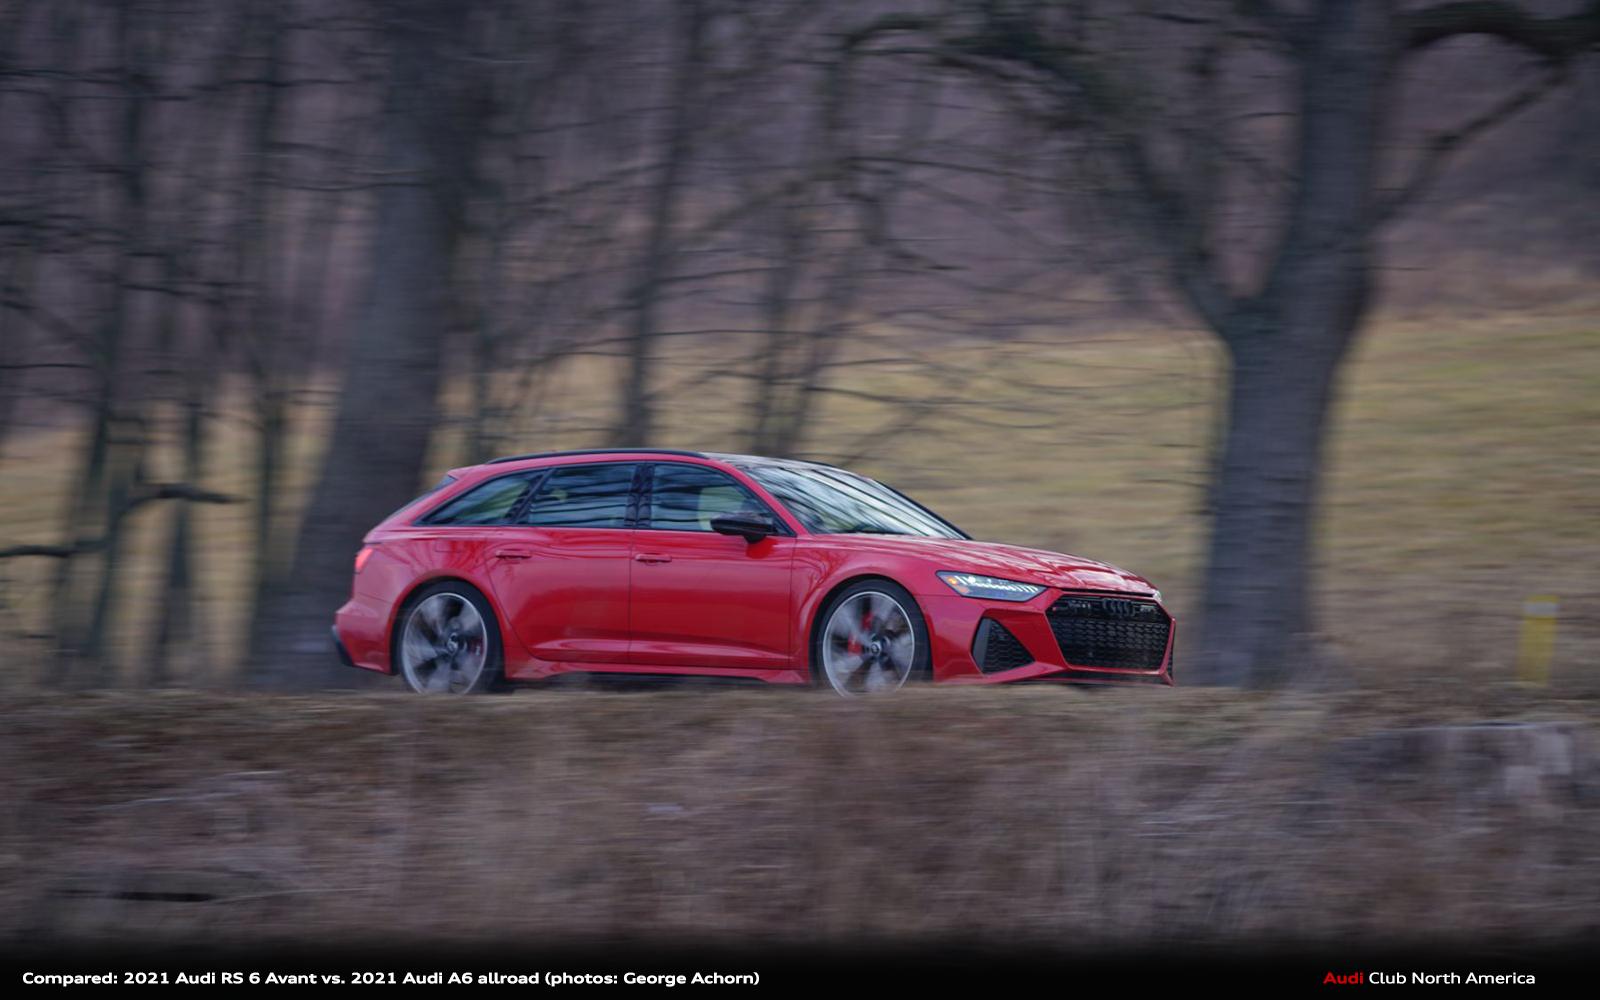 Compared: 2021 Audi RS 6 Avant vs. 2021 Audi A6 allroad - Enthusiast Unit vs. Consumer Unit